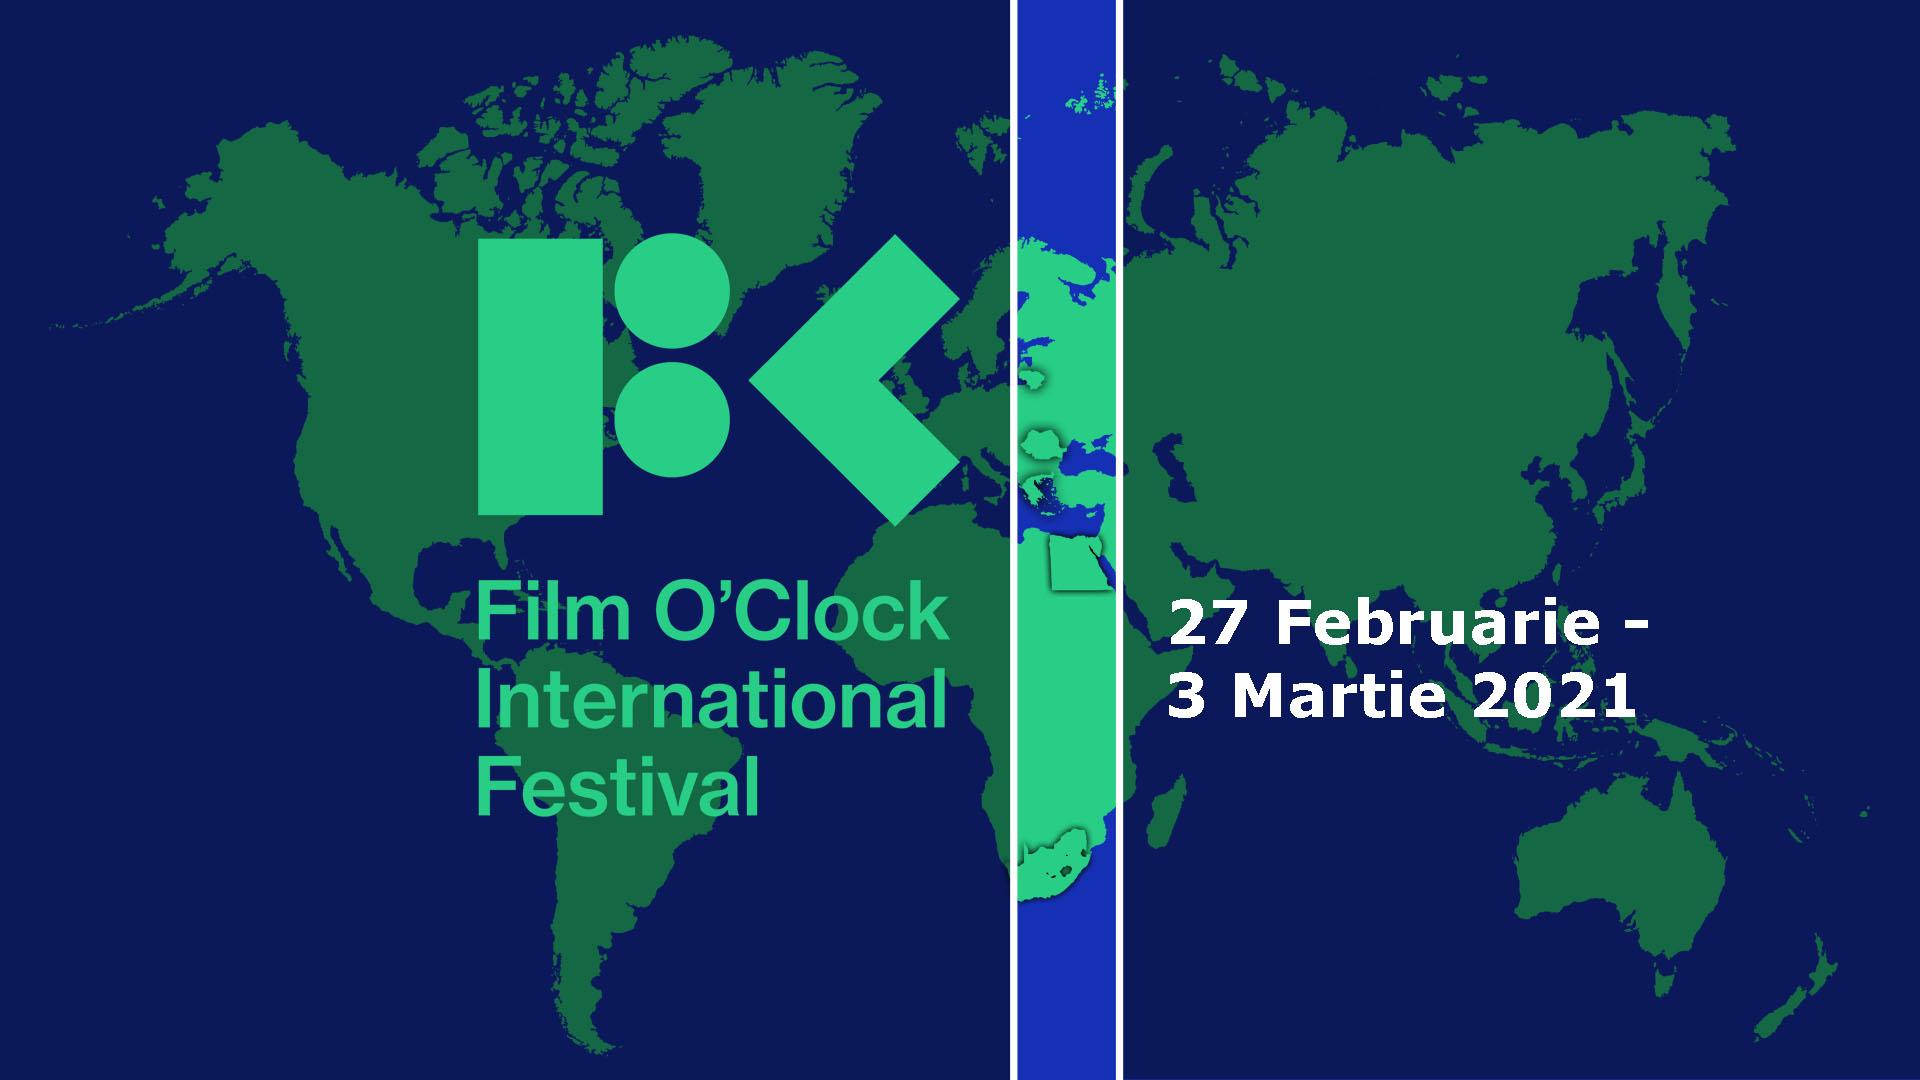 Festivalul Internațional Film O'Clock